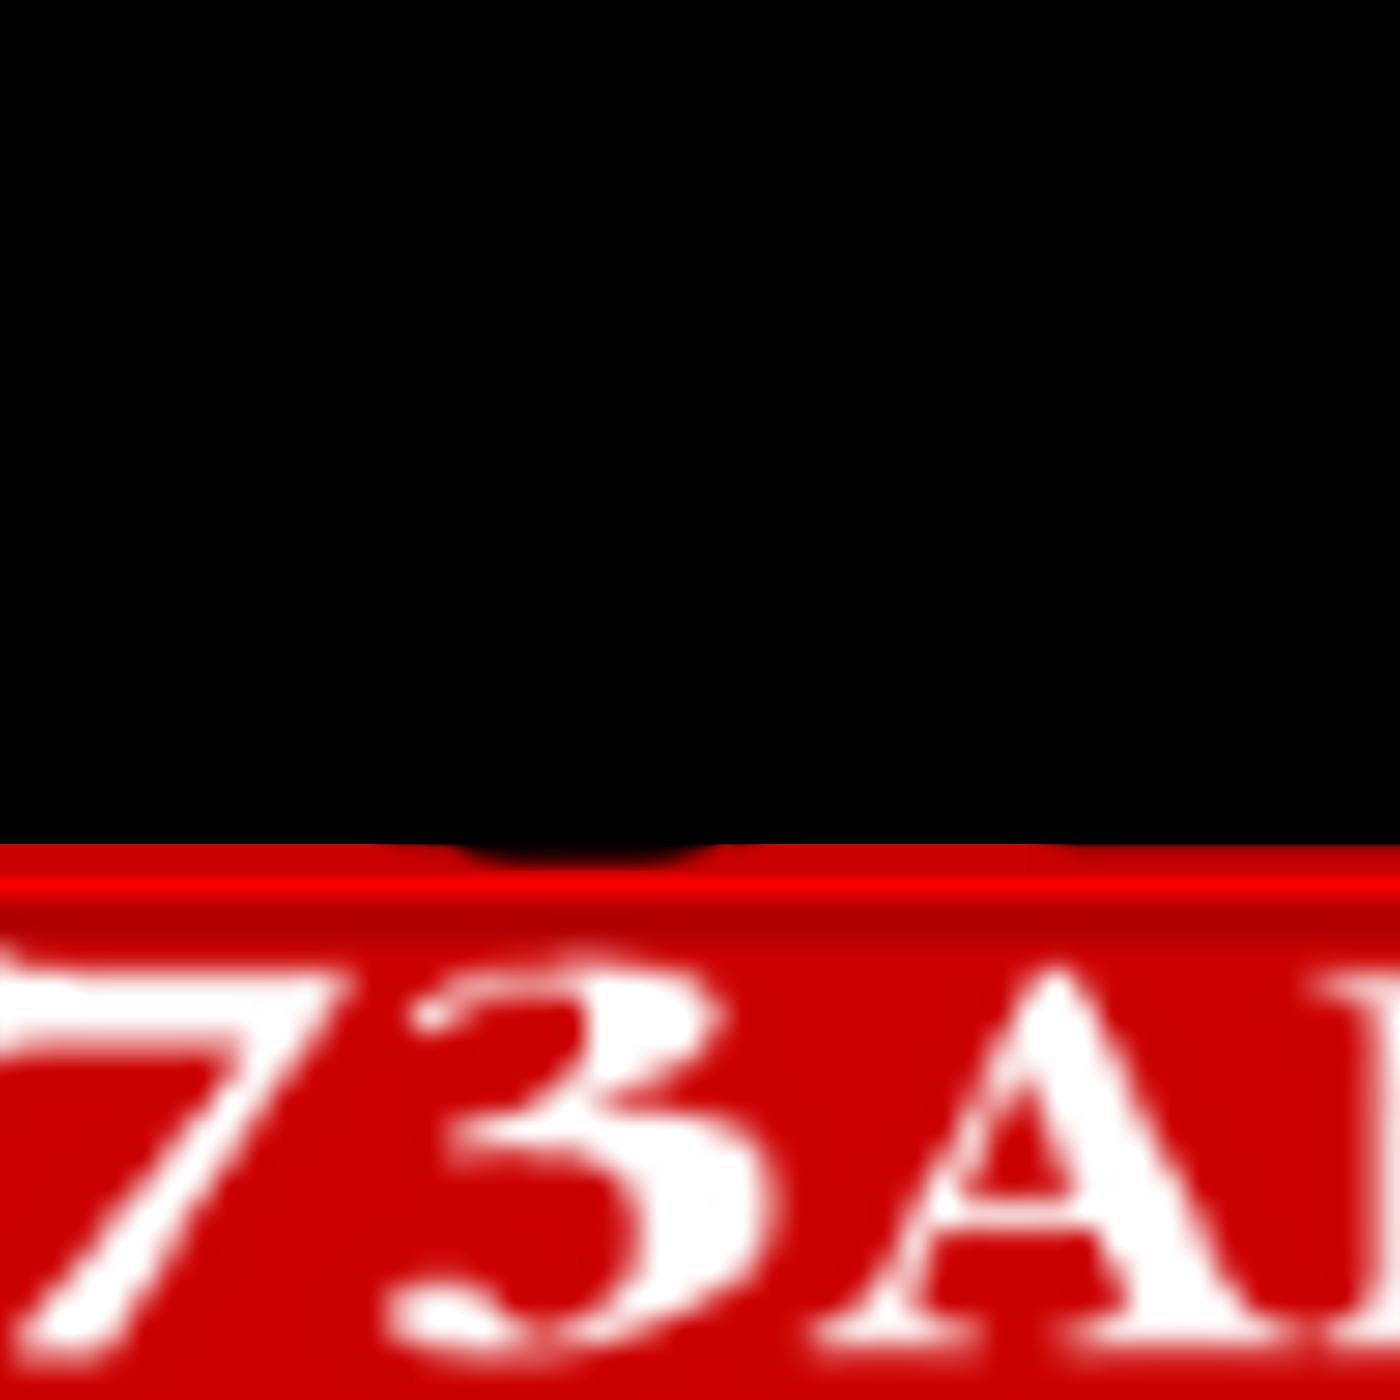 V8ptlc91ray0wh3nuiko logo 1 radio 2gb logo